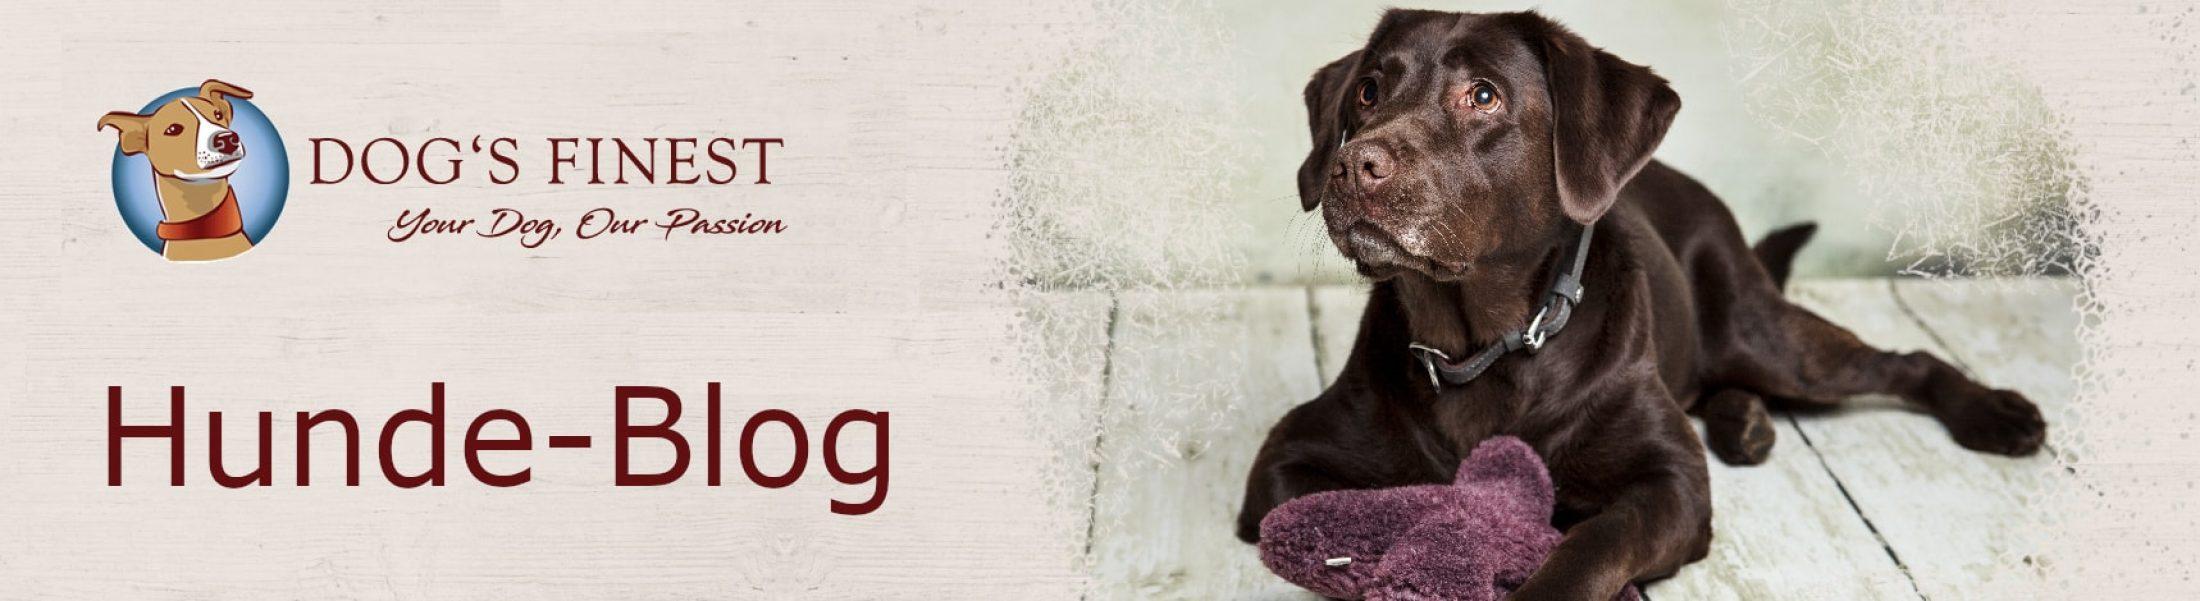 Hunde-Blog